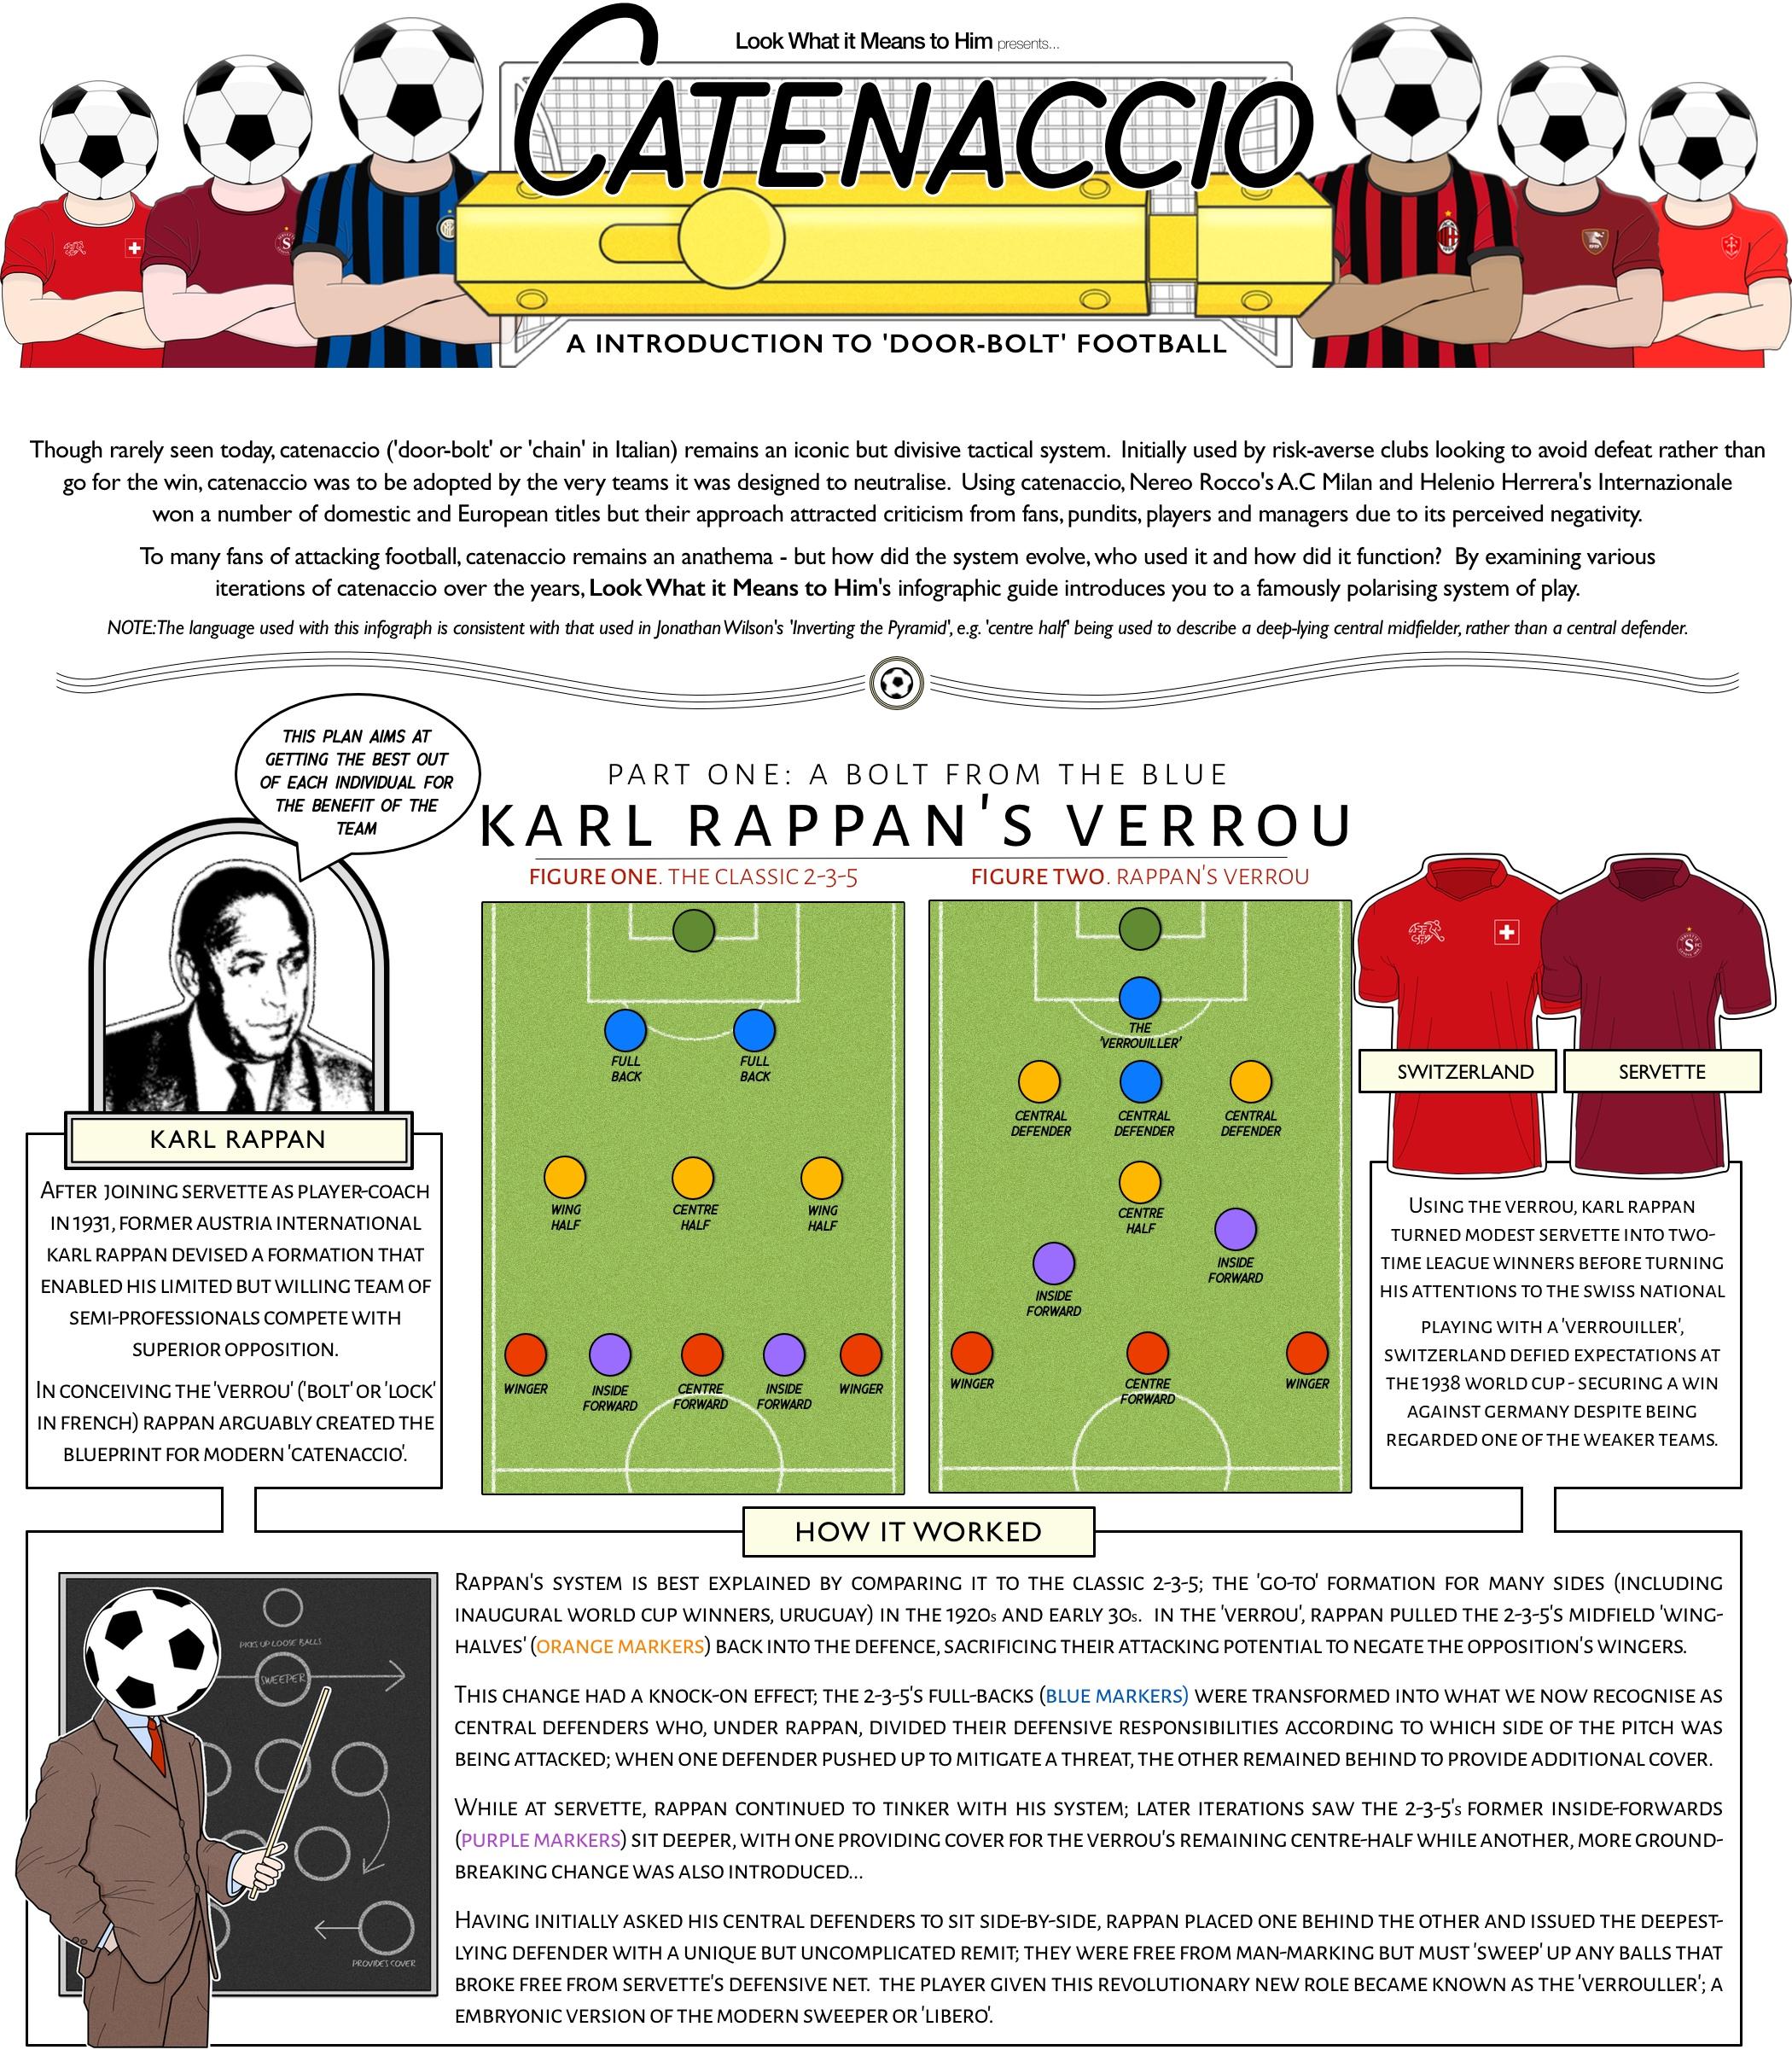 LWIMTH Catenaccio One.jpg